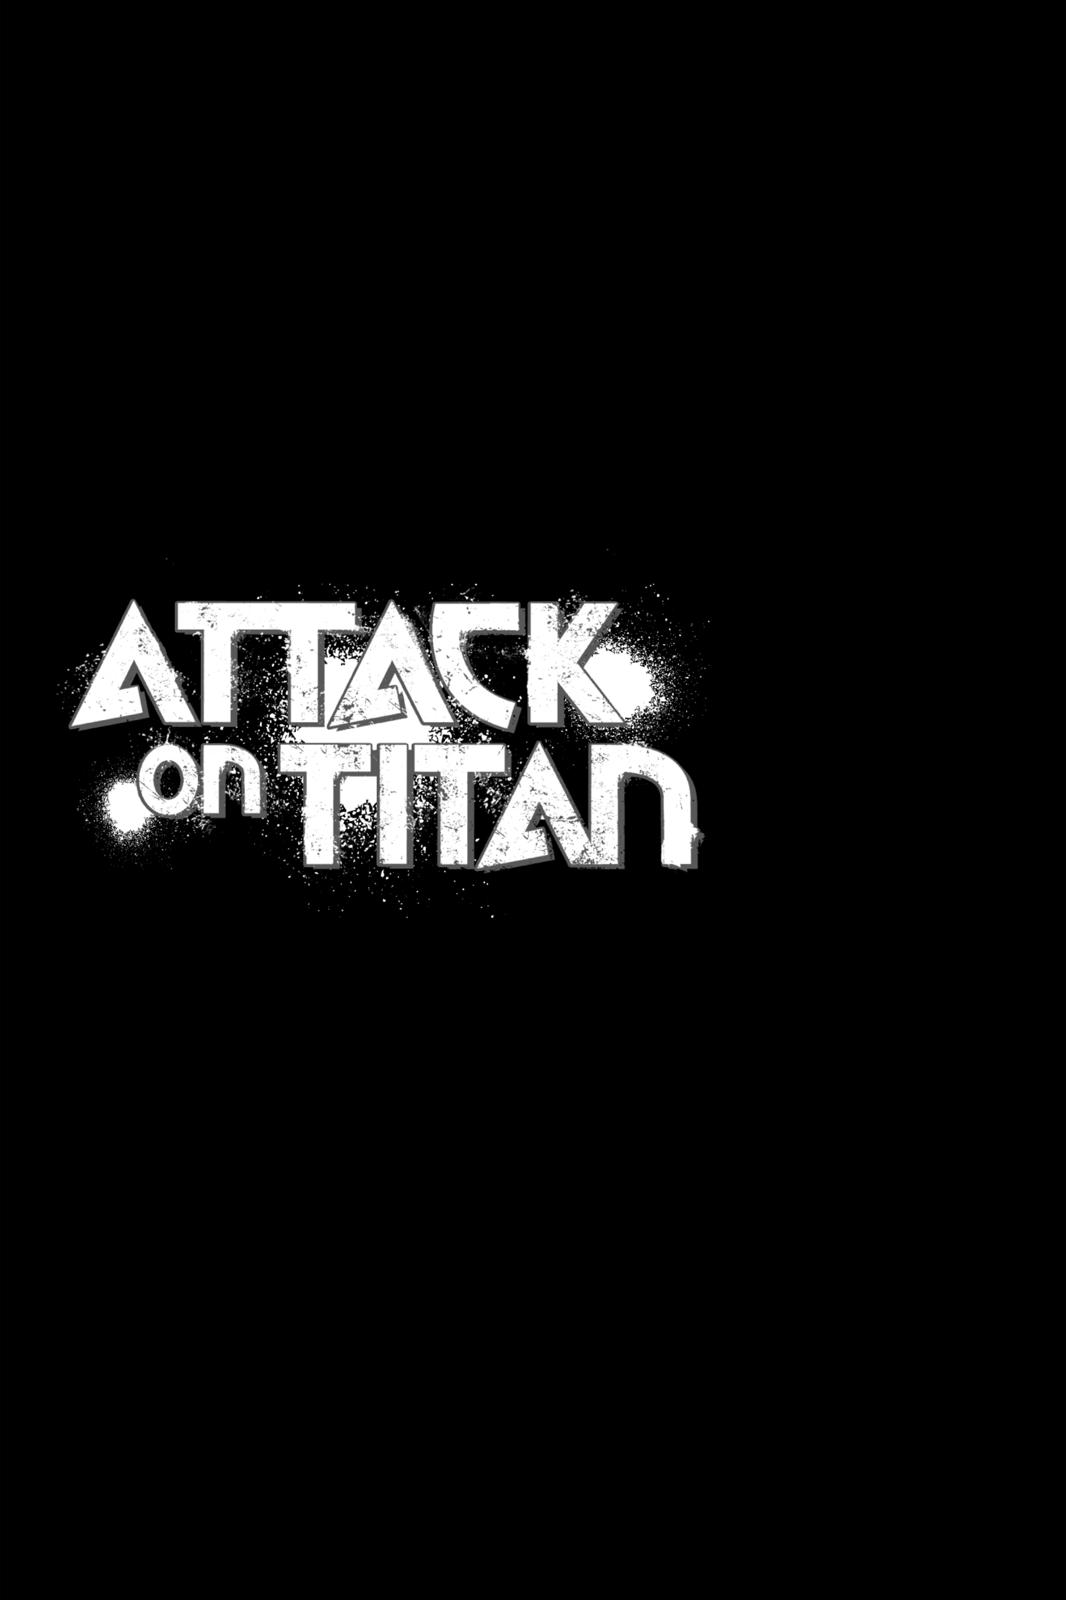 Attack On Titan, Episode 124 image 046